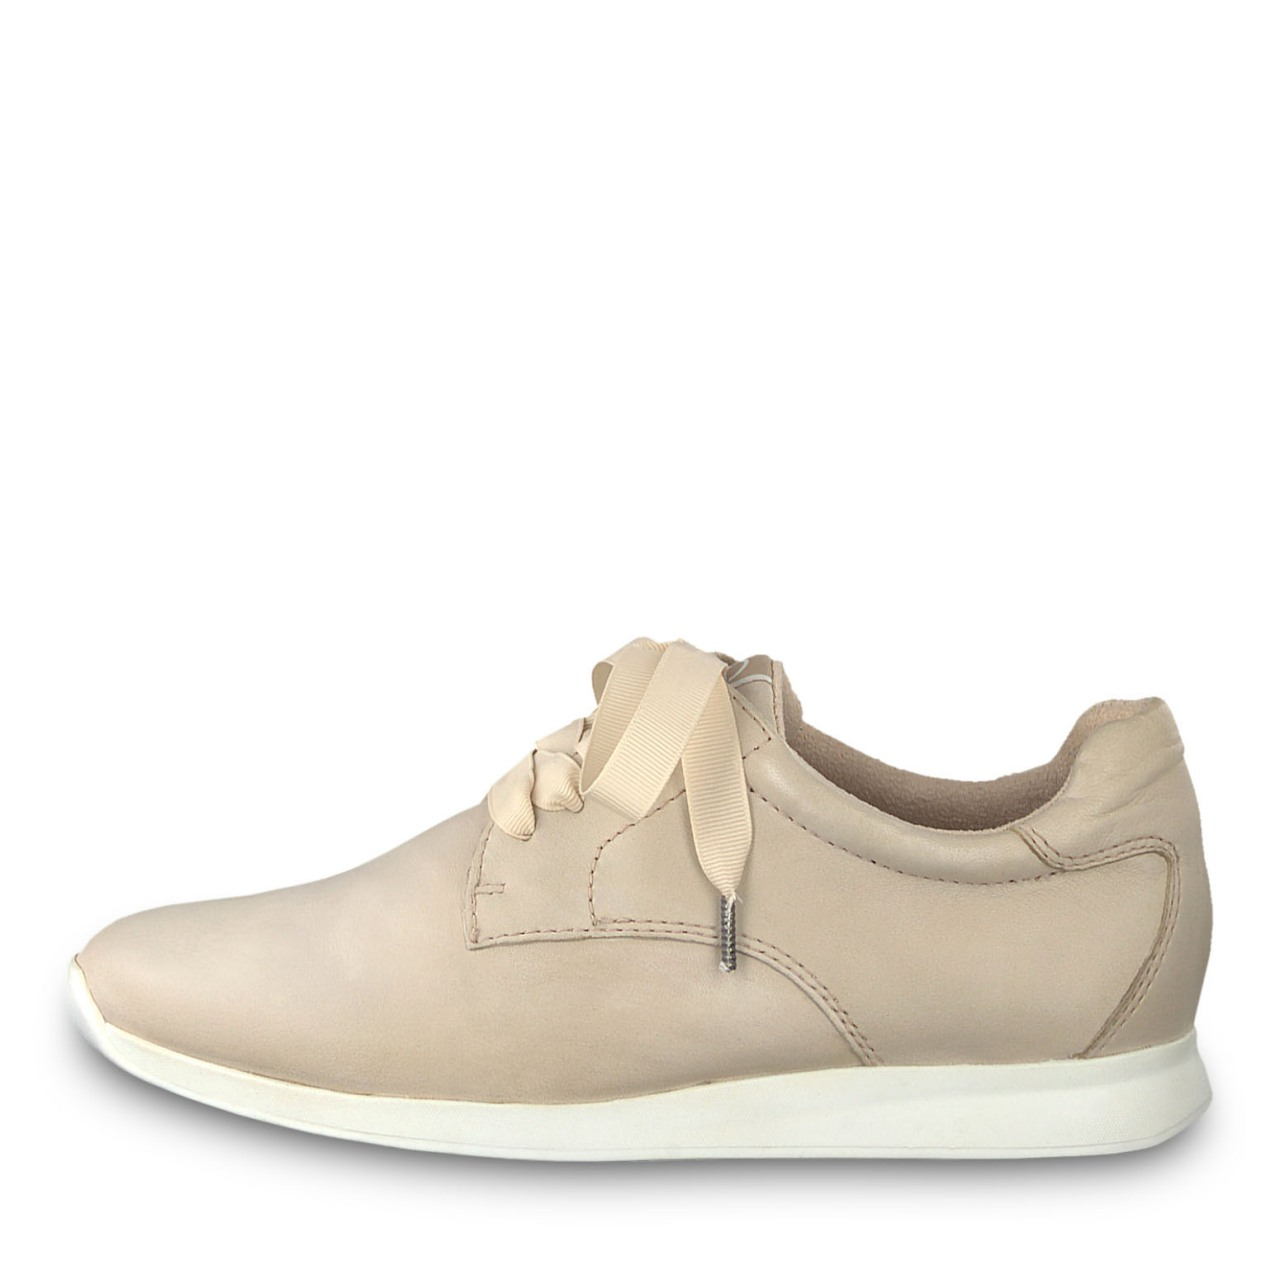 e4e8f06a1c4c Tamaris rose sneaker skinn – Tamaris Rosa sneaker i skinn – Mio Trend